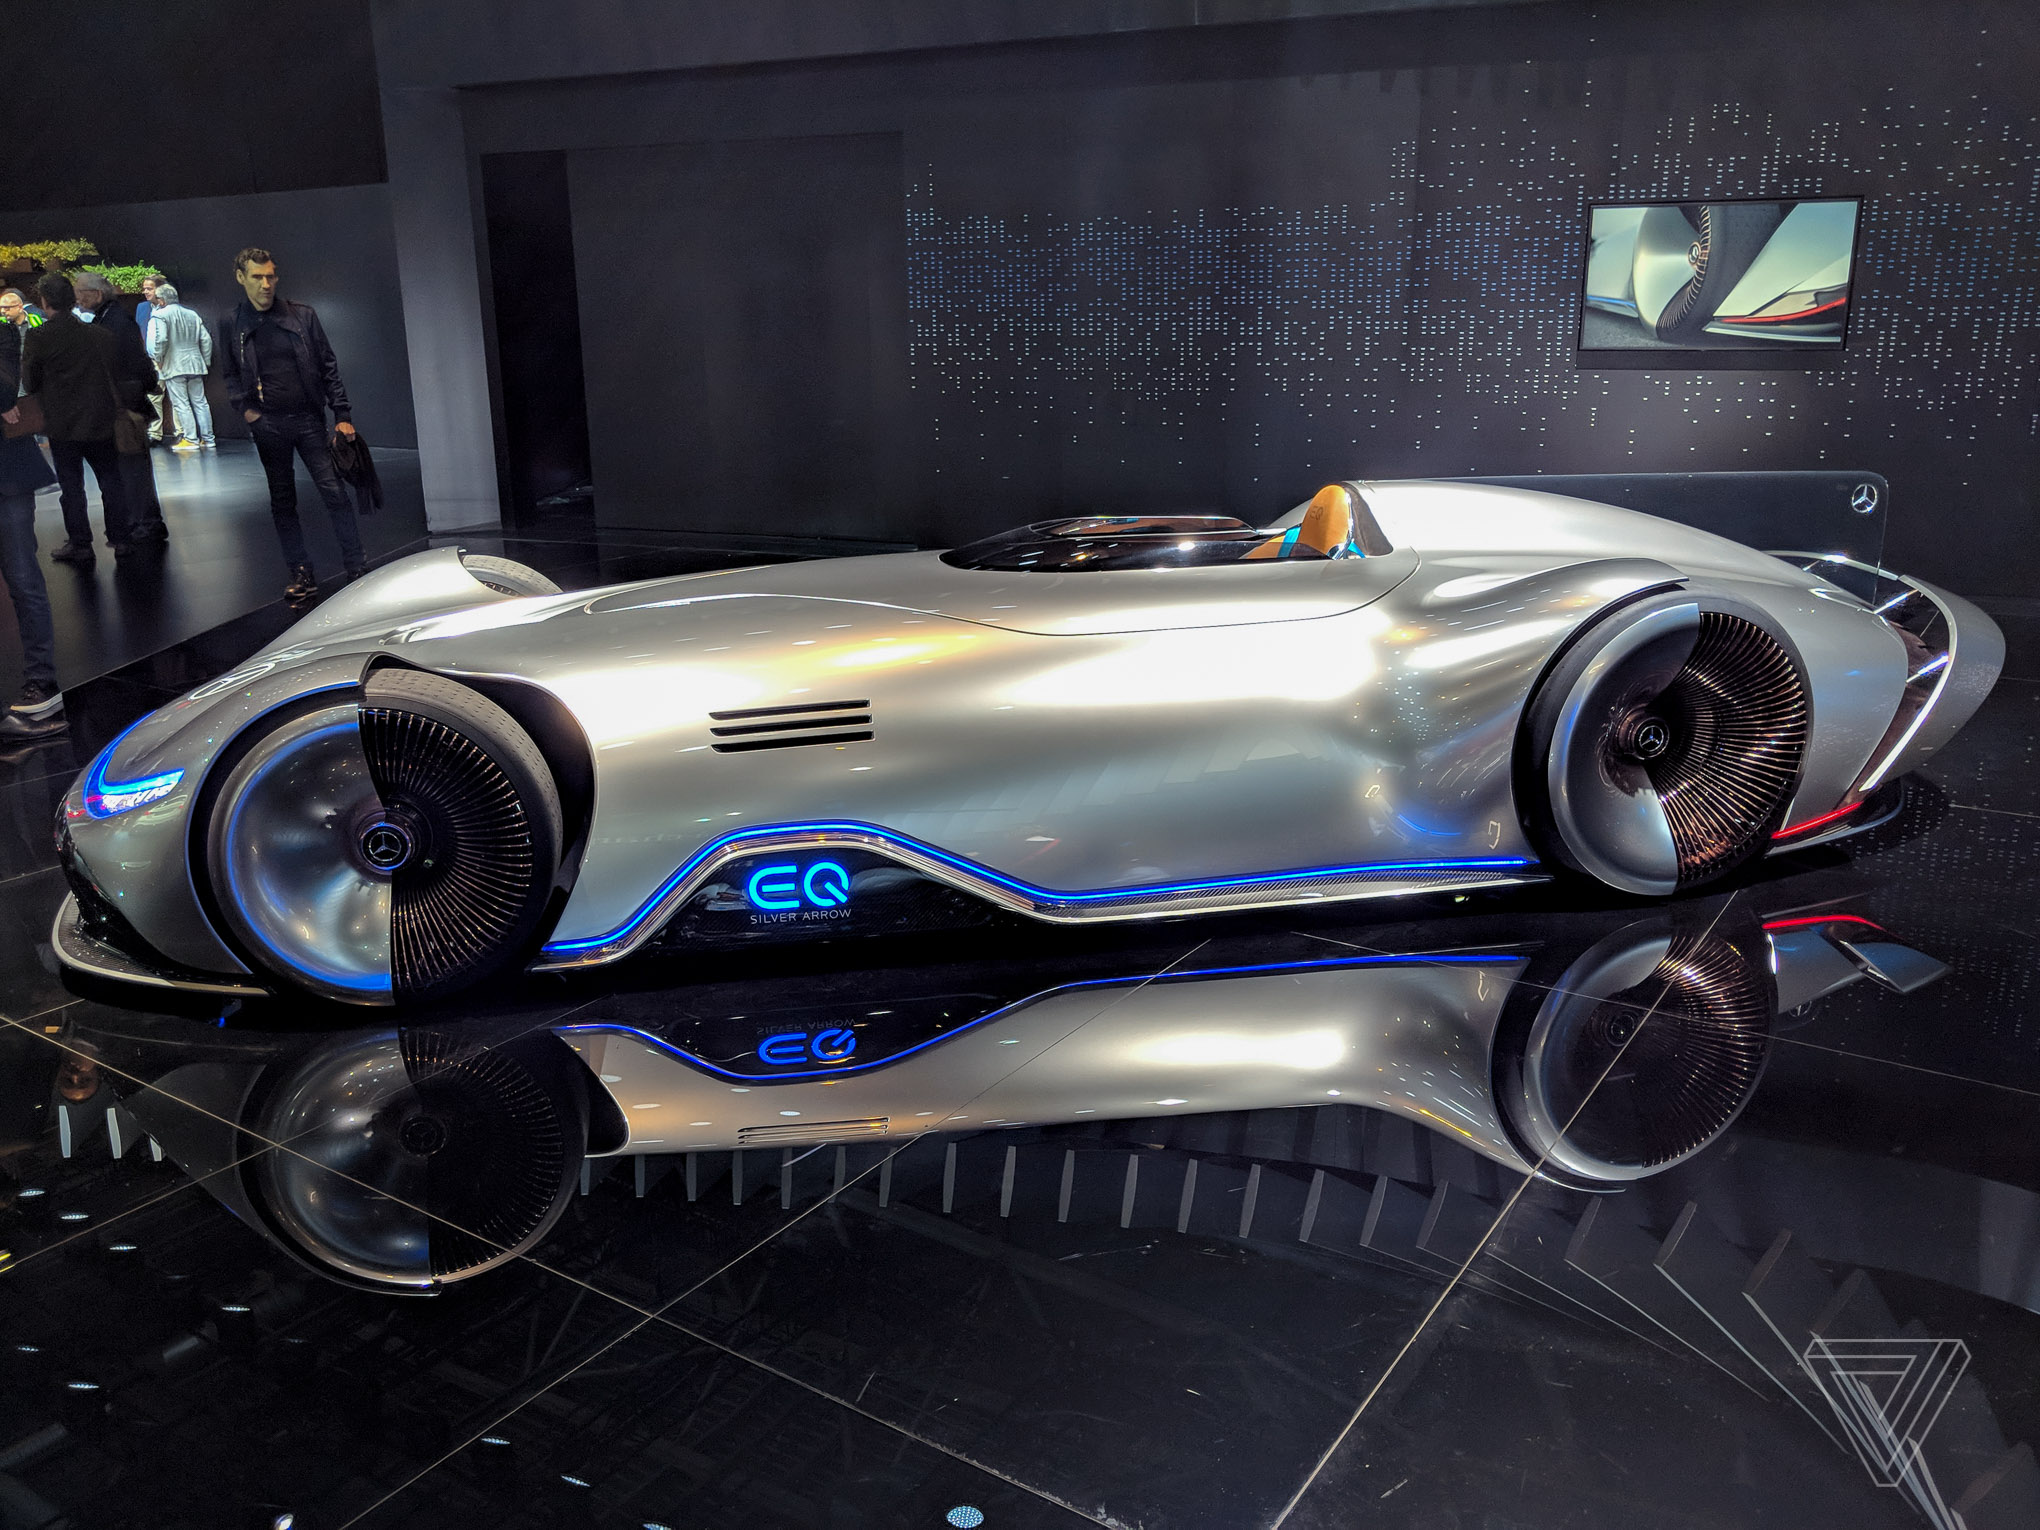 Mercedes Eq Silver Arrow Blends Retro Design With Electric